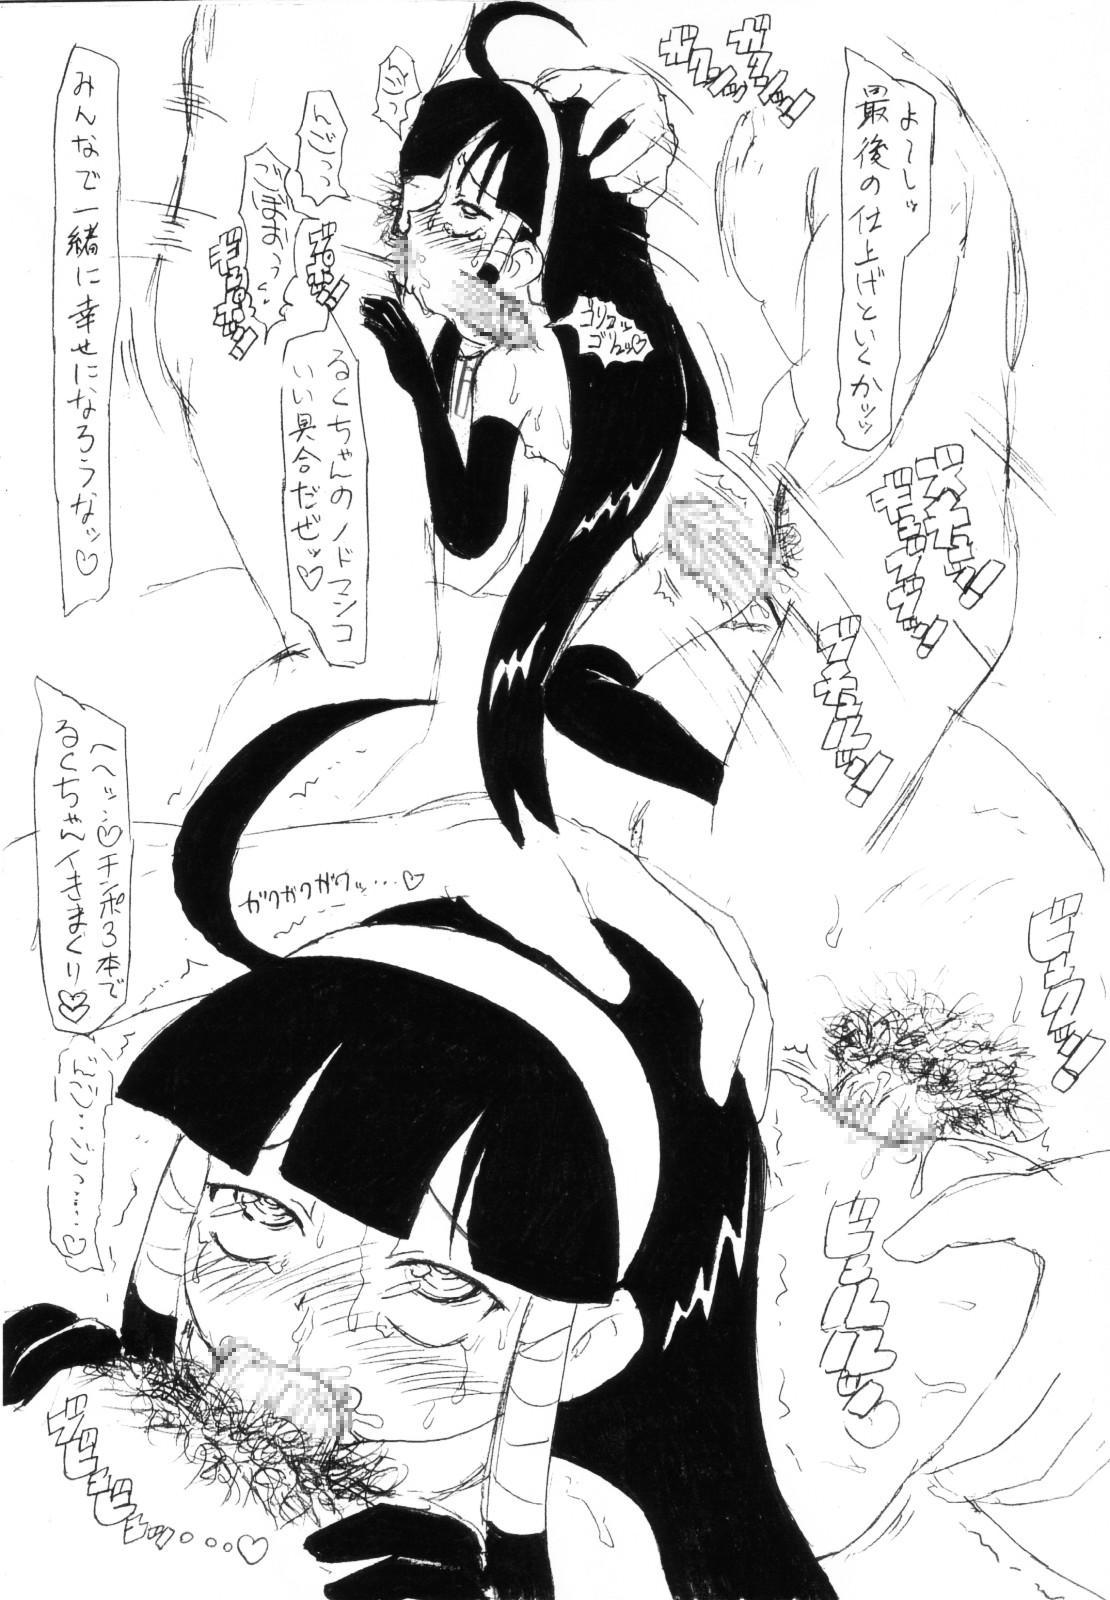 [愚直屋(Spec-R)] (from [FLAT RACING] S30Z) 4